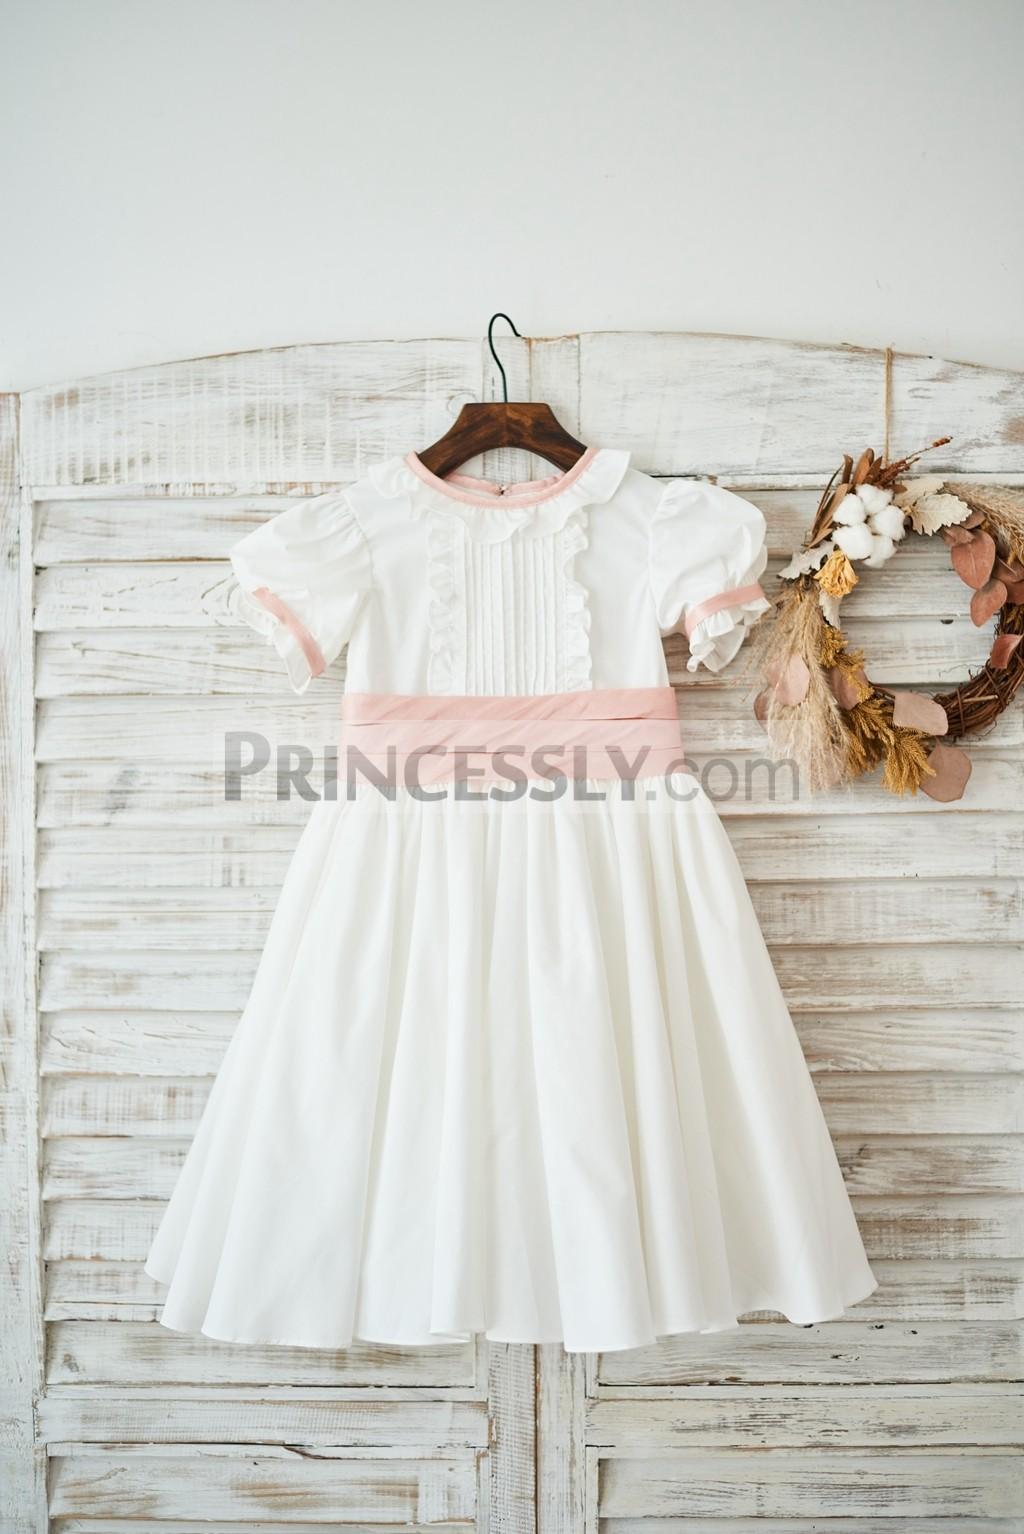 Puffy Short Sleeves Jewel Neck Ivory Cotton Wedding Flower Girl Dress